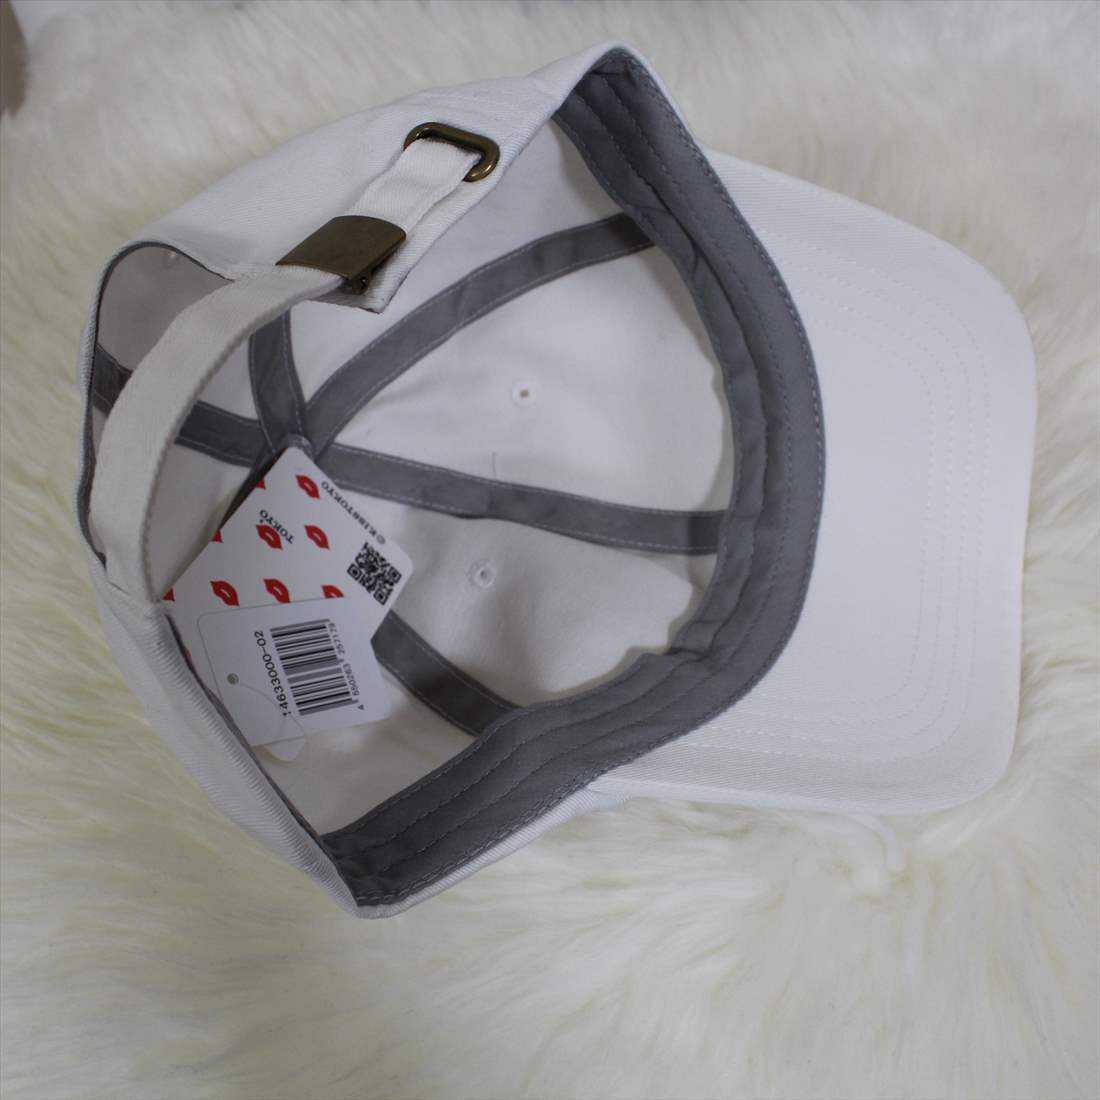 KISS TOKYO LIP LOGO LOW CAP サイドロゴ刺繍 ホワイト キャップ 新品 白 帽子_画像5